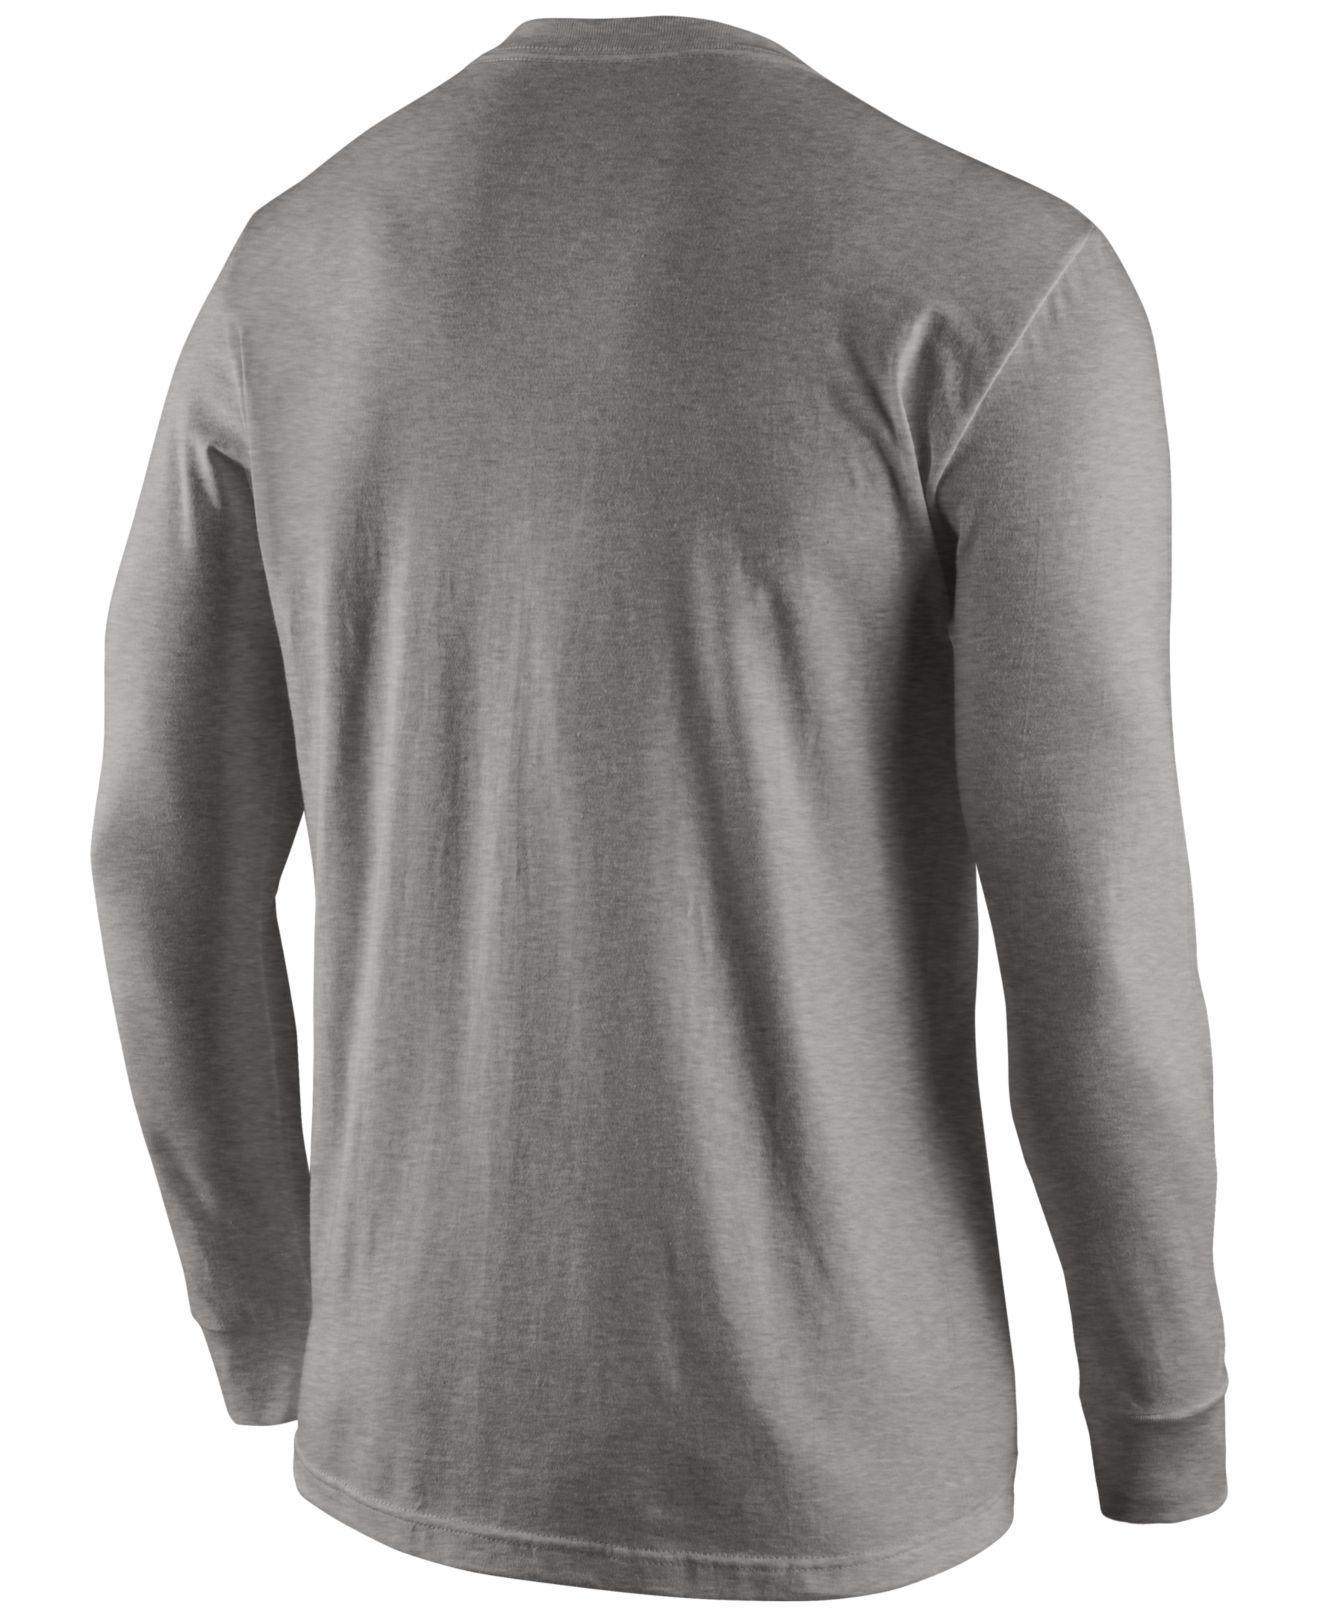 Lyst - Nike Men s Long-sleeve Pittsburgh Steelers Reflective T-shirt ... 7f76fd7d3